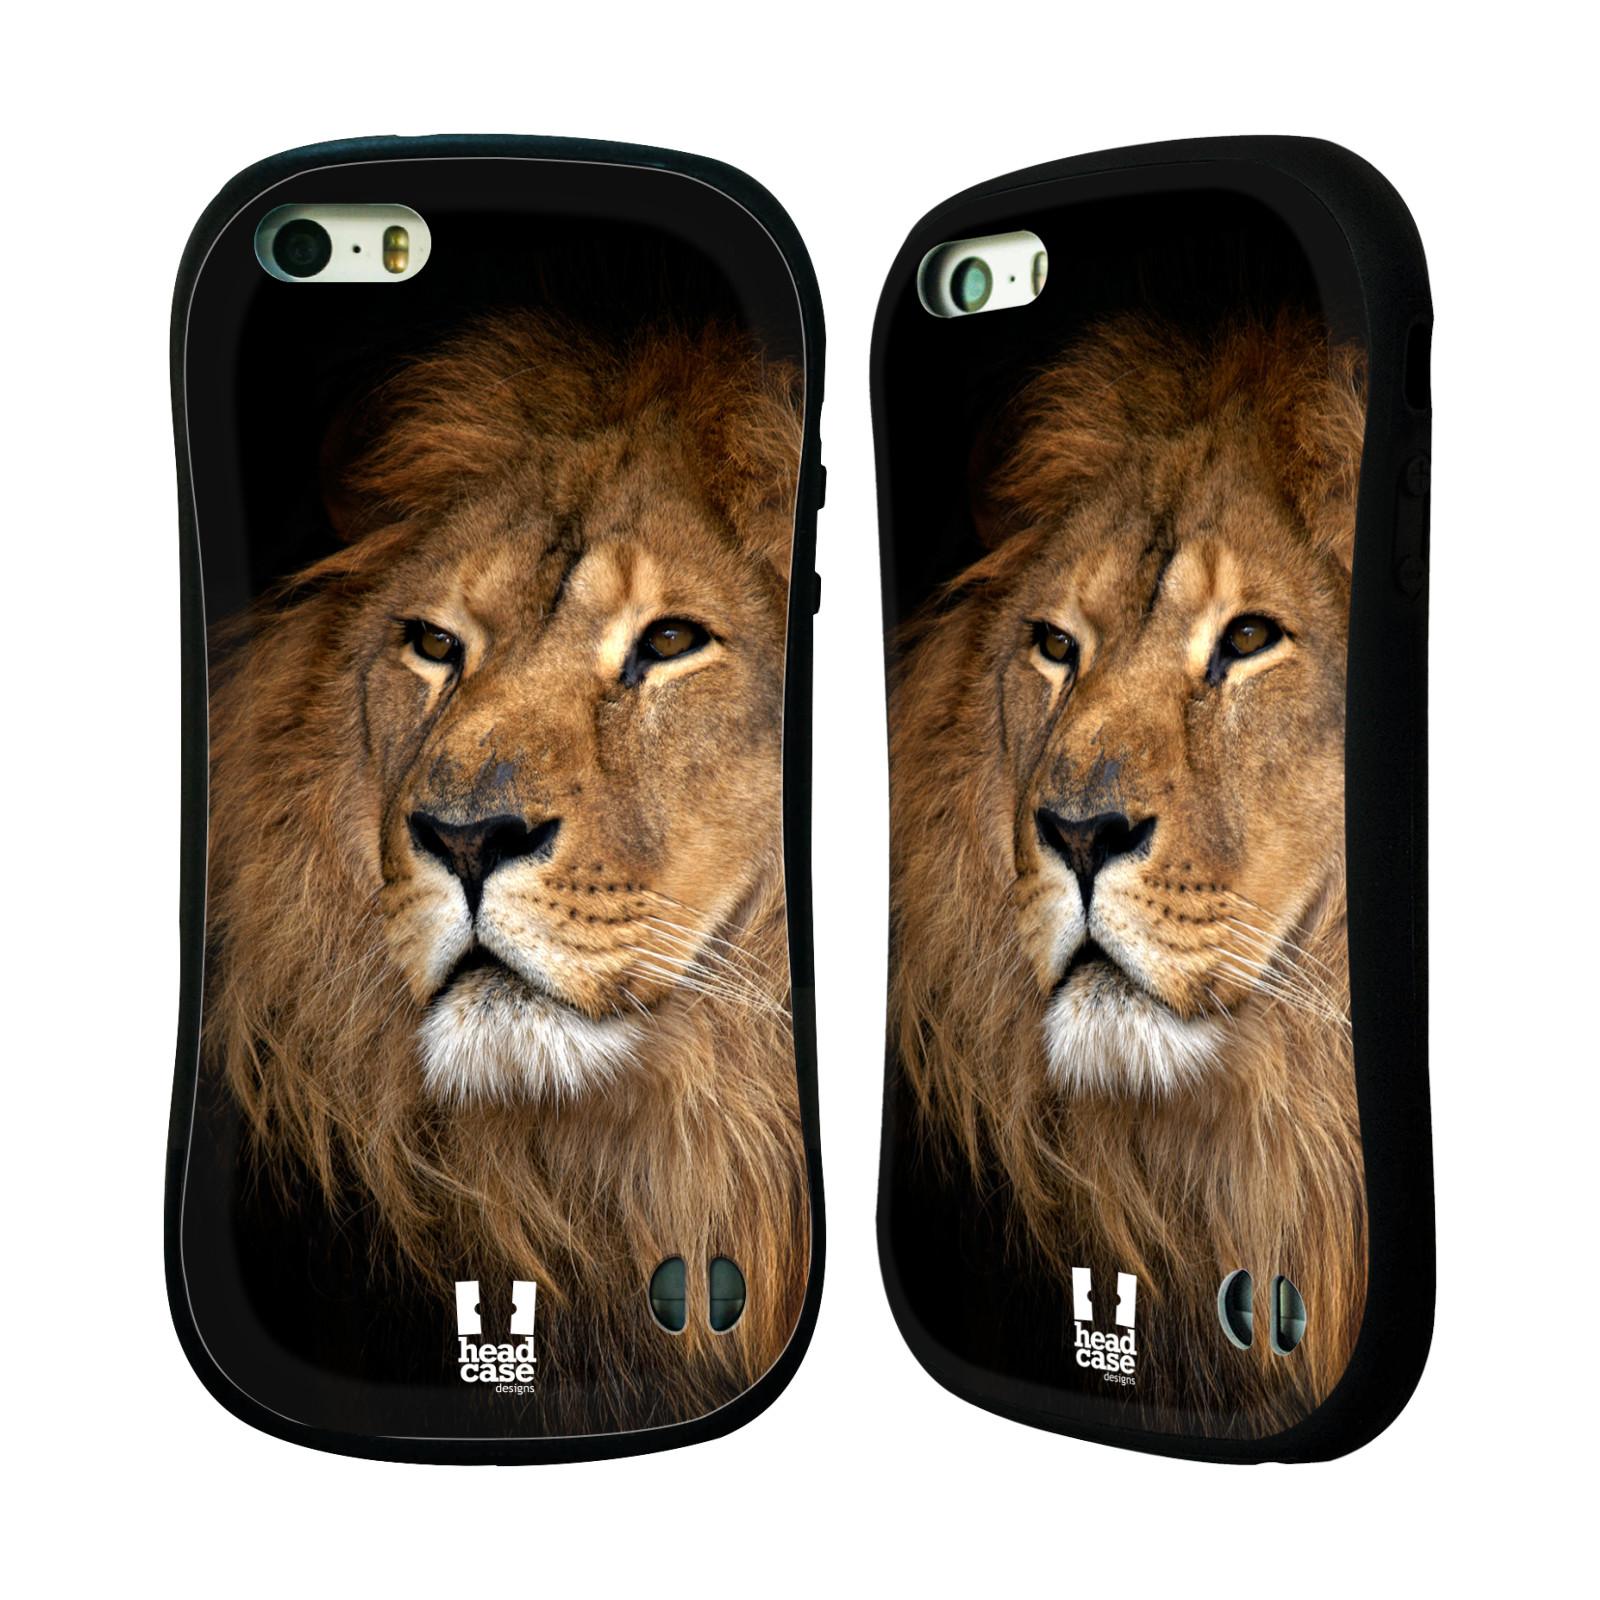 HEAD CASE silikon/plast odolný obal na mobil Apple Iphone 5/5S vzor Divočina, Divoký život a zvířata foto LEV KRÁL ZVÍŘAT